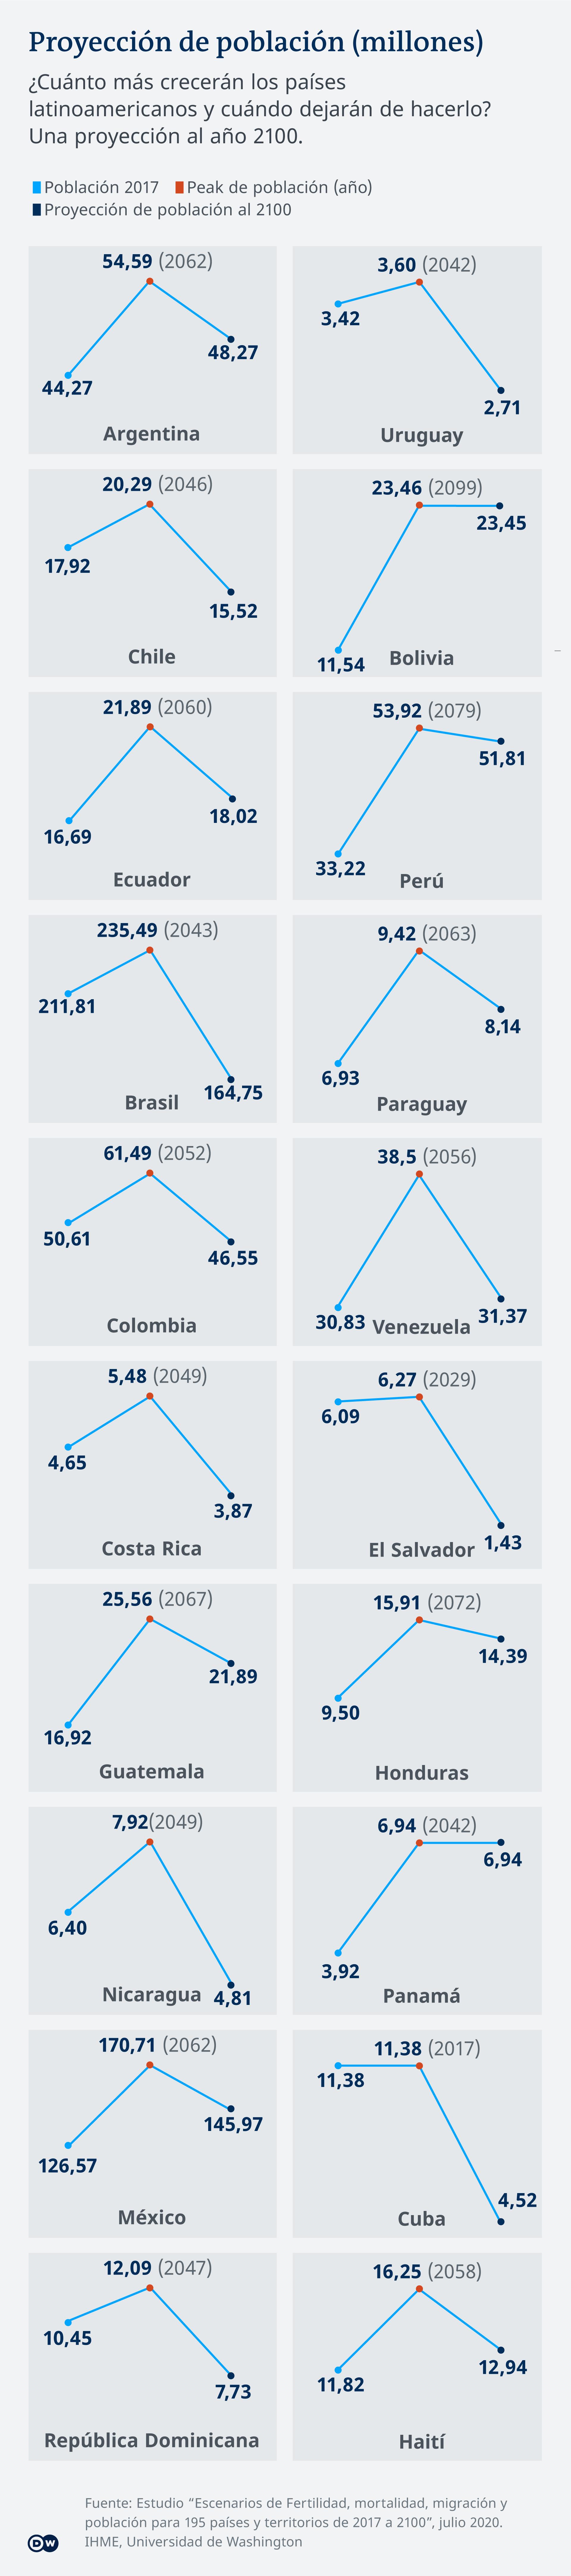 Infografik - Projektion Bevölkerung Lateinamerica - ES